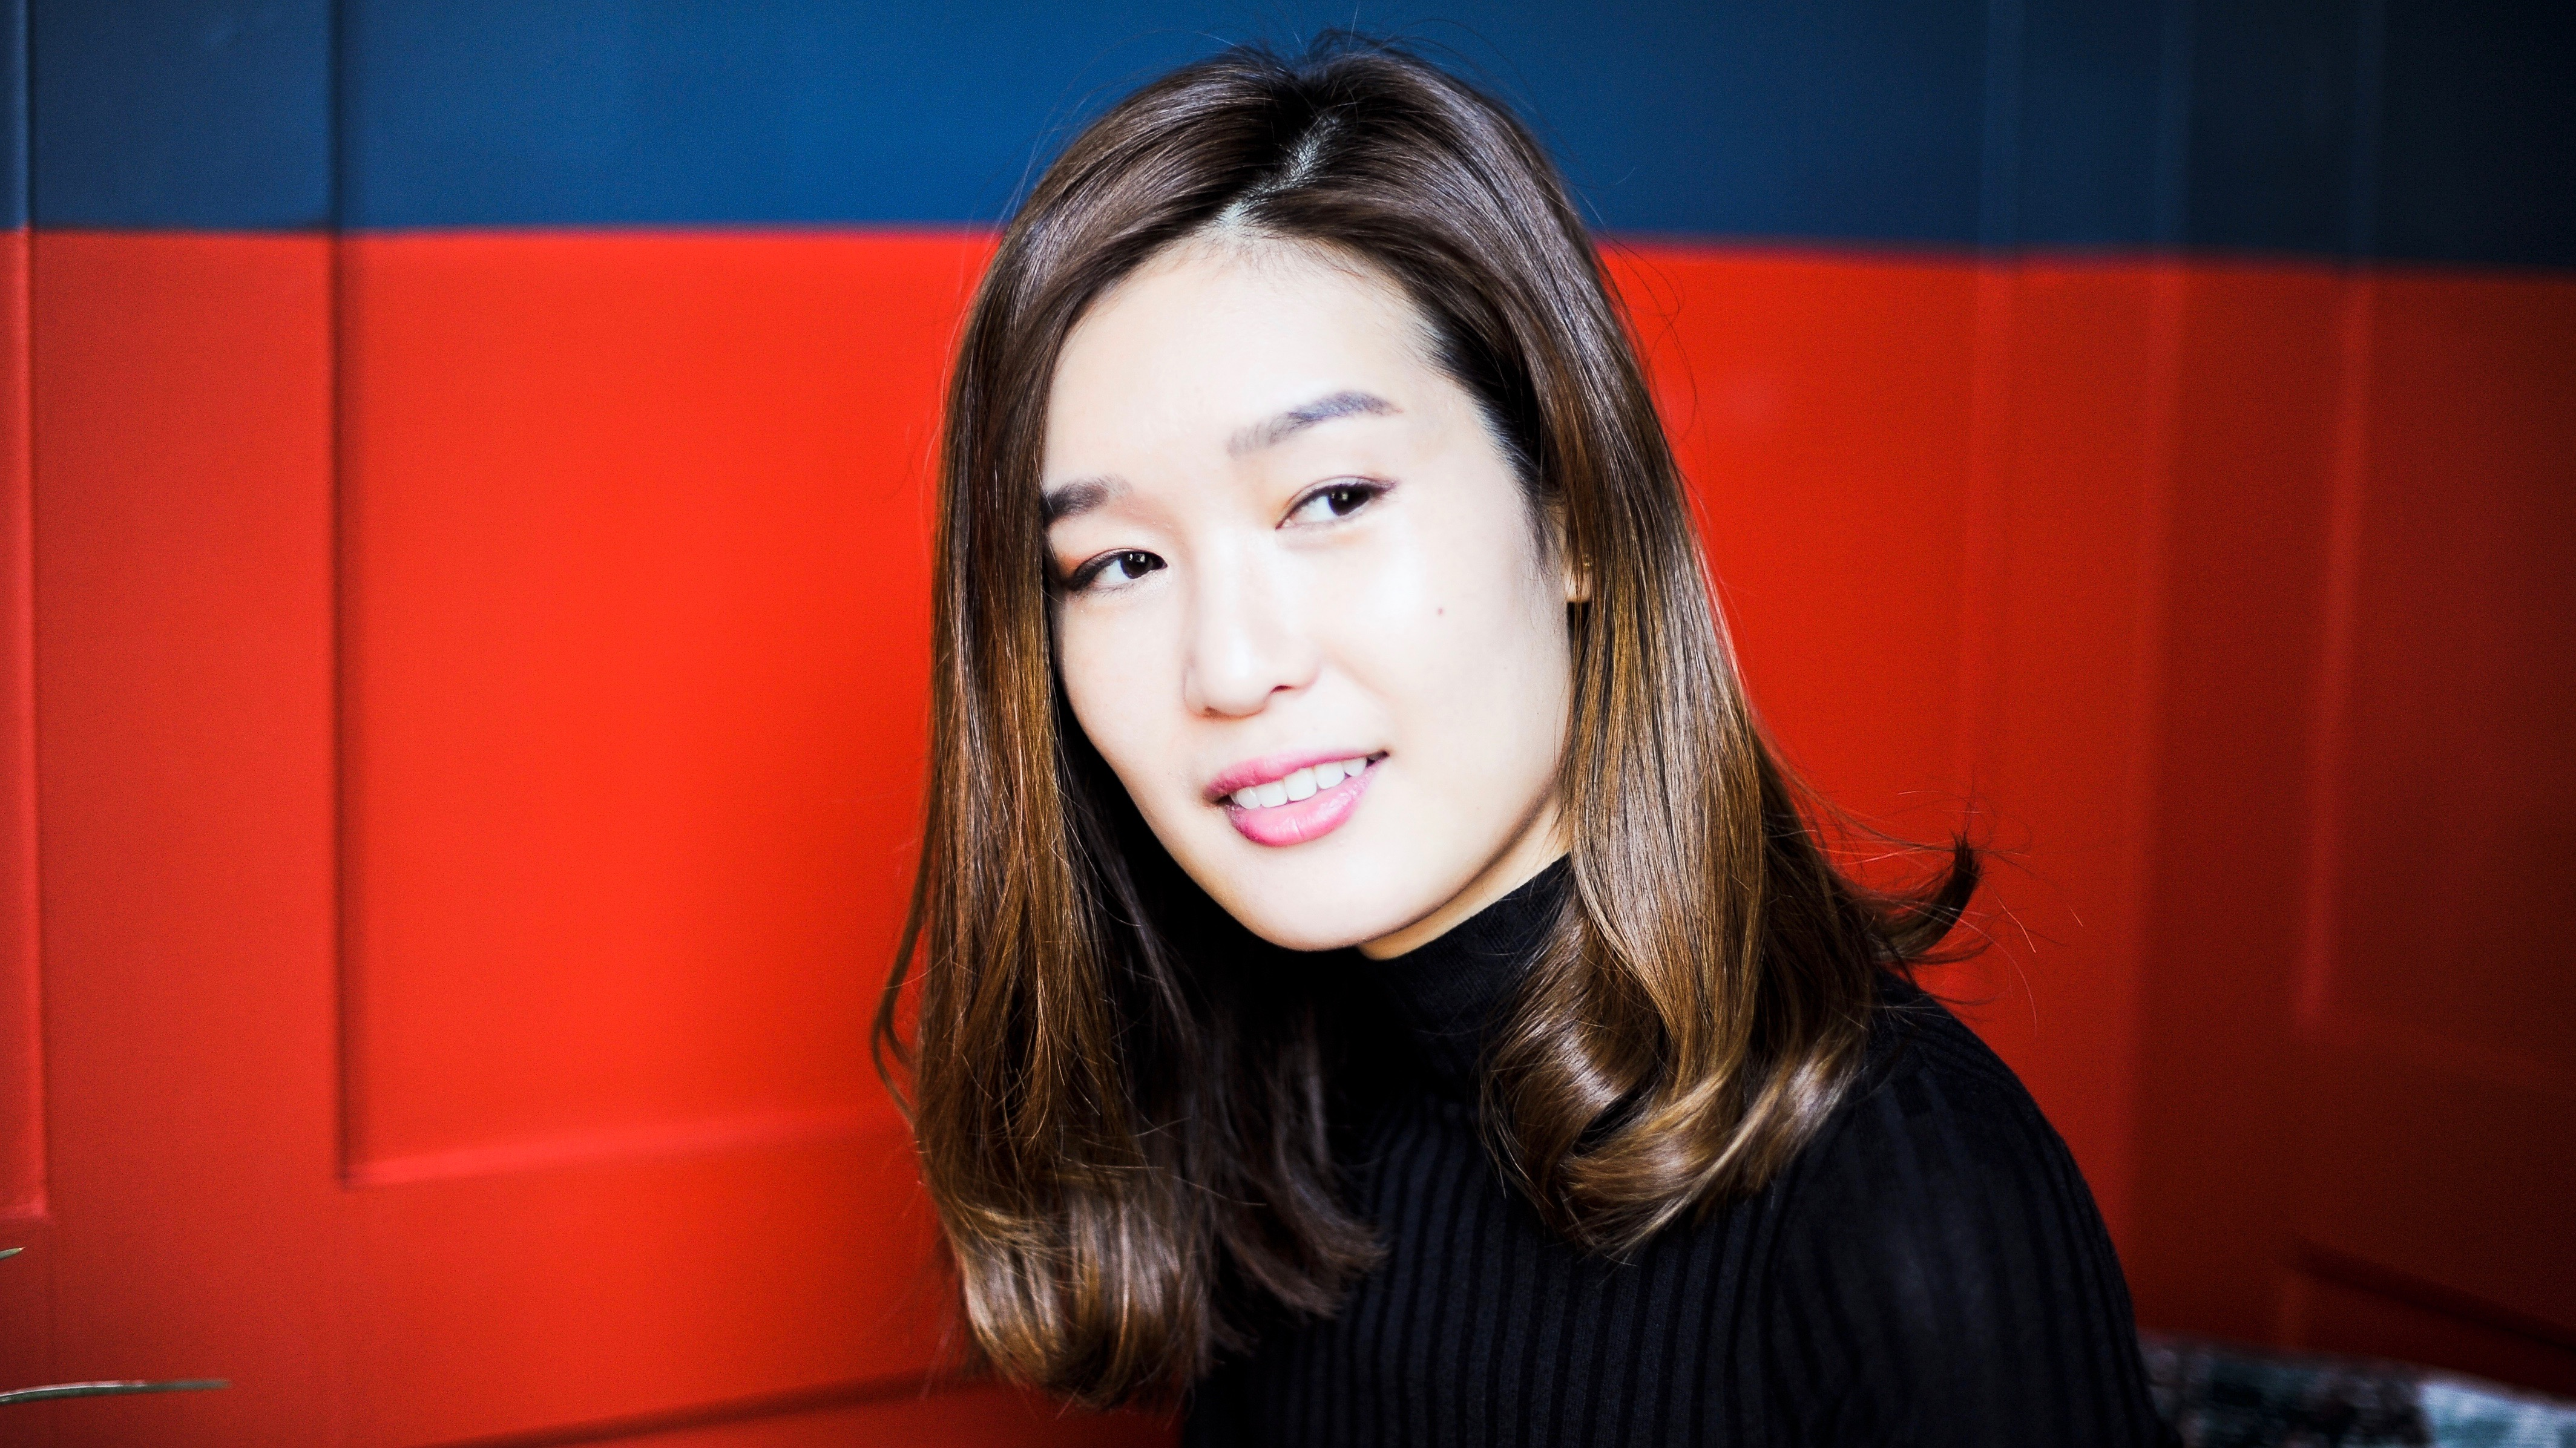 Korean Beauty Guru Charlotte Cho Predicts This Year's Big Trends